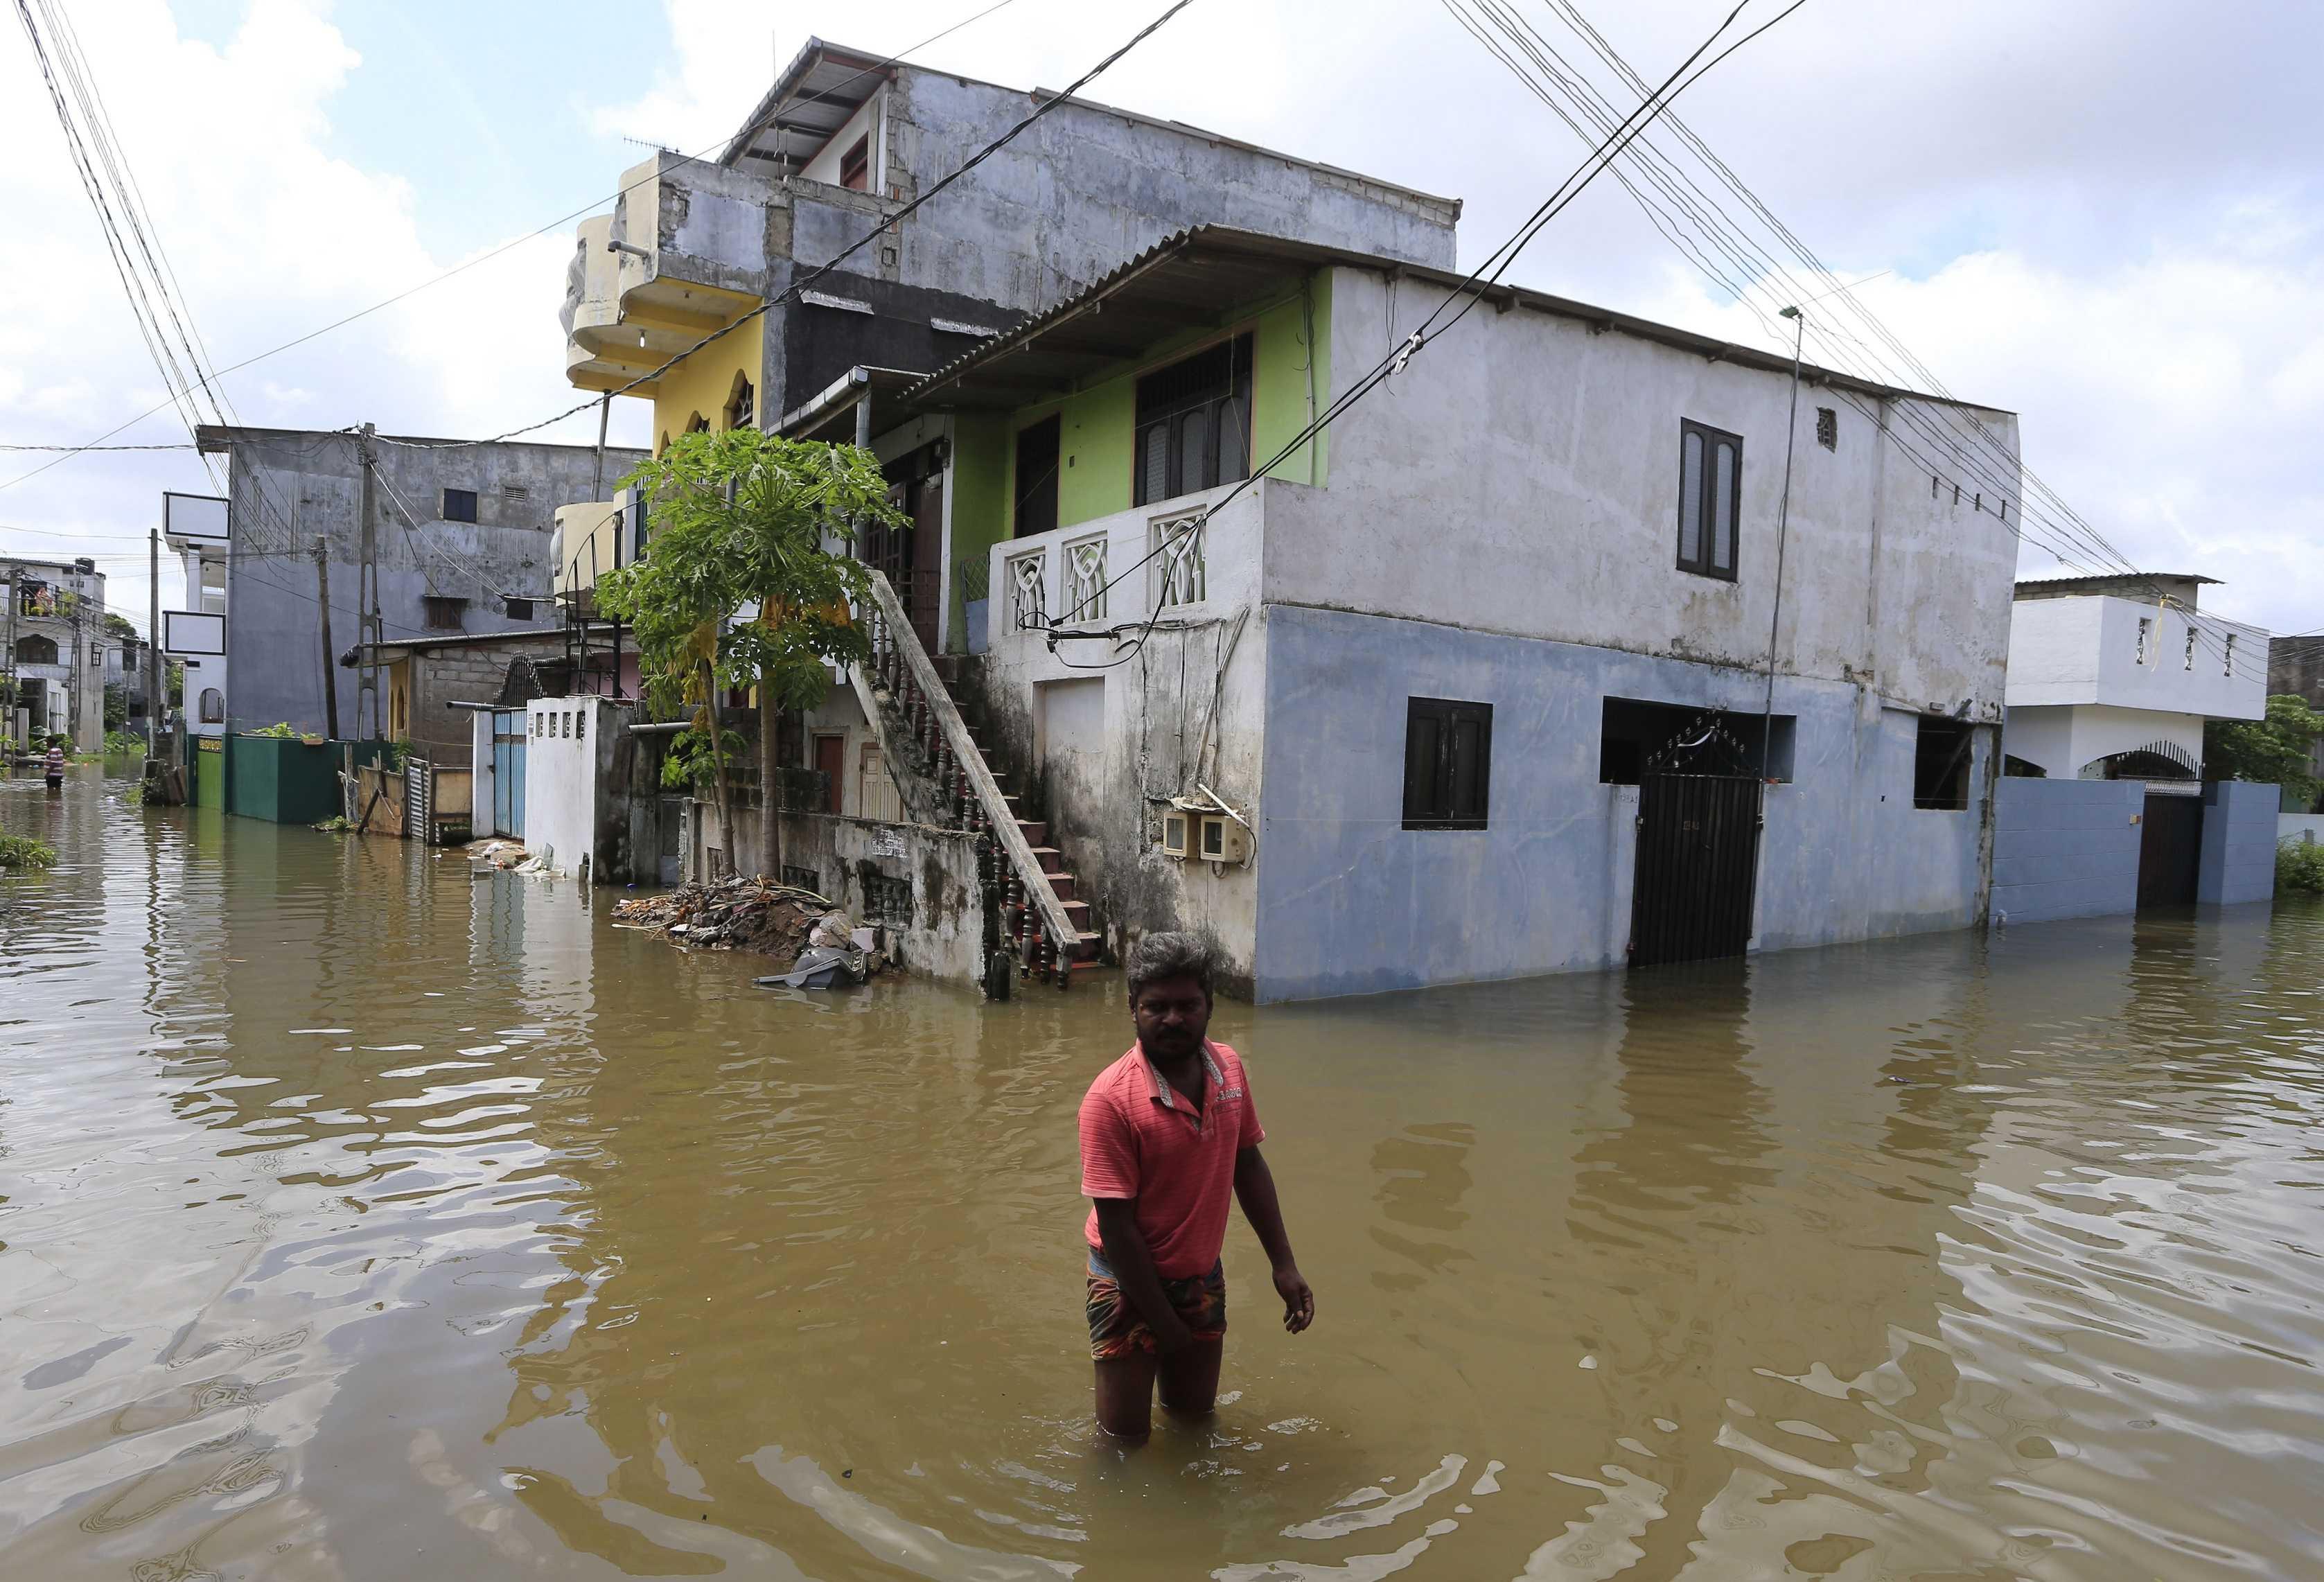 Sri Lanka flooding reaches worst point in 14 years